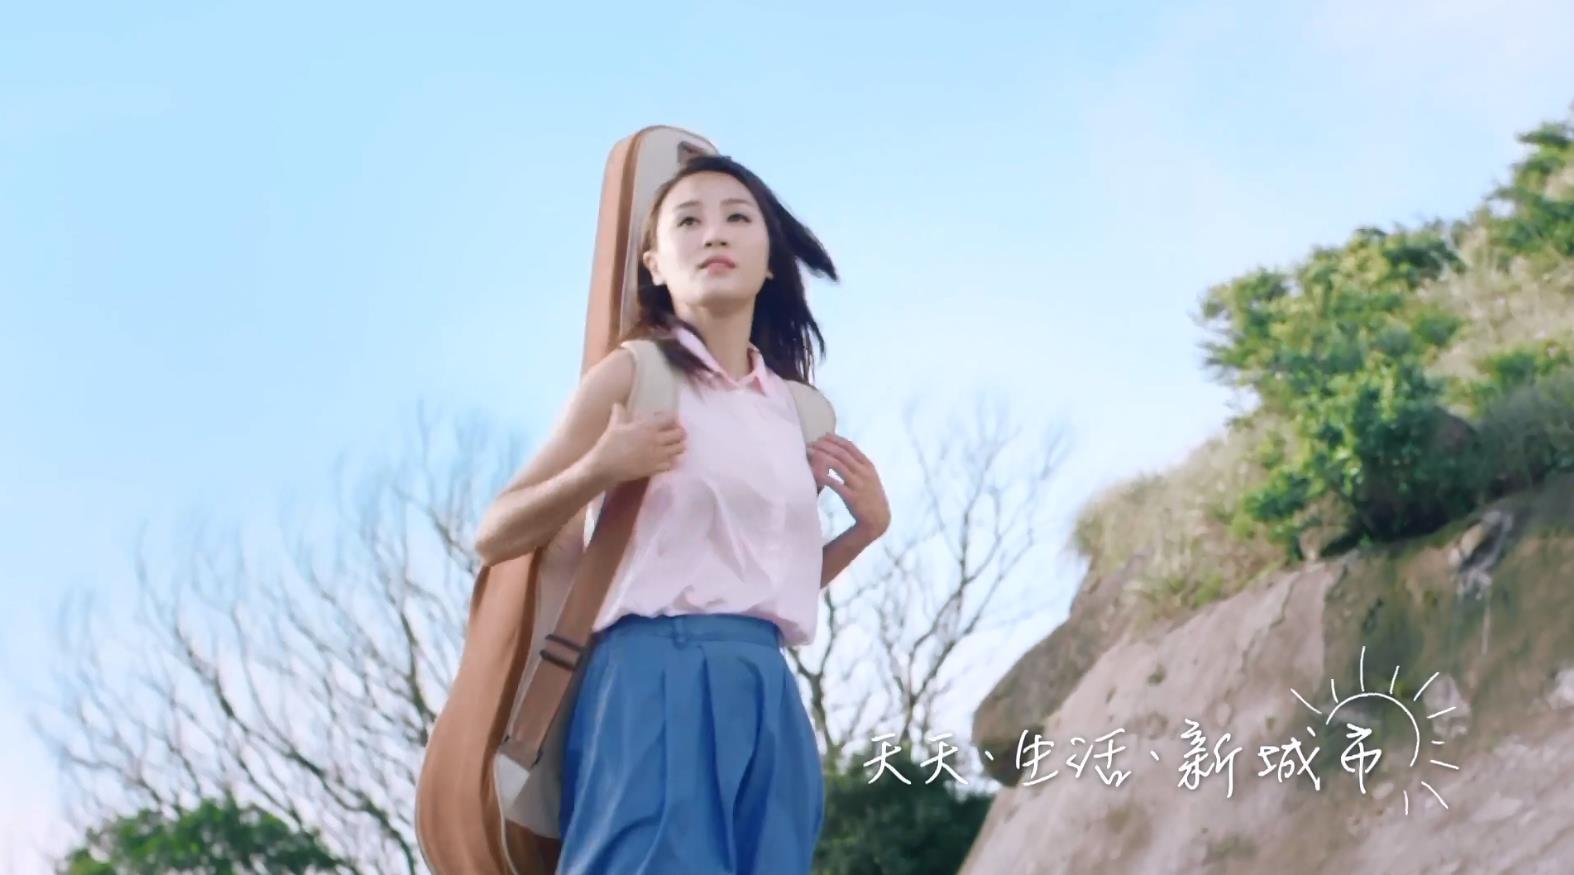 Nice-Cheer x商城  苏韵姿、谷微  唱歌 广告